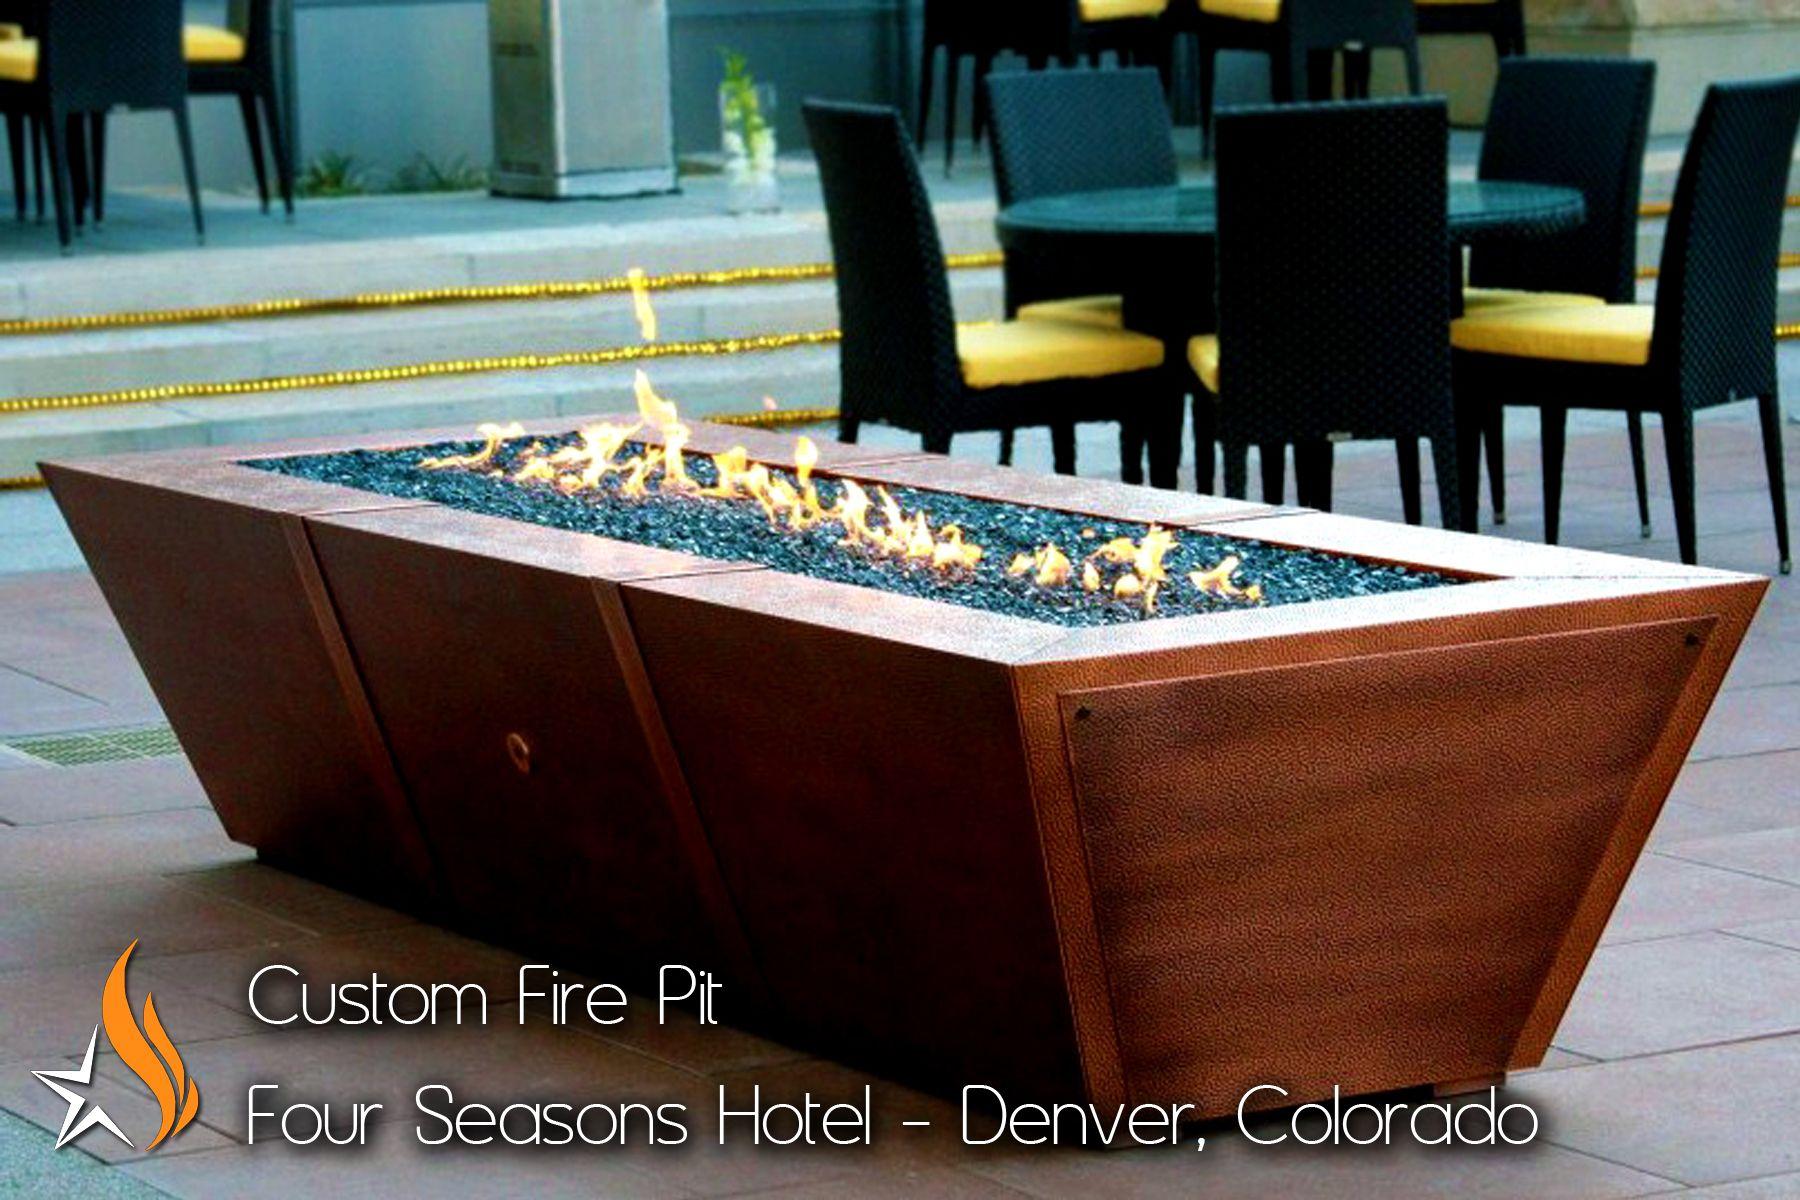 10 Copper Spartan Fire Pit Rectangular Fire Pit Fire Pit Copper Fire Pit